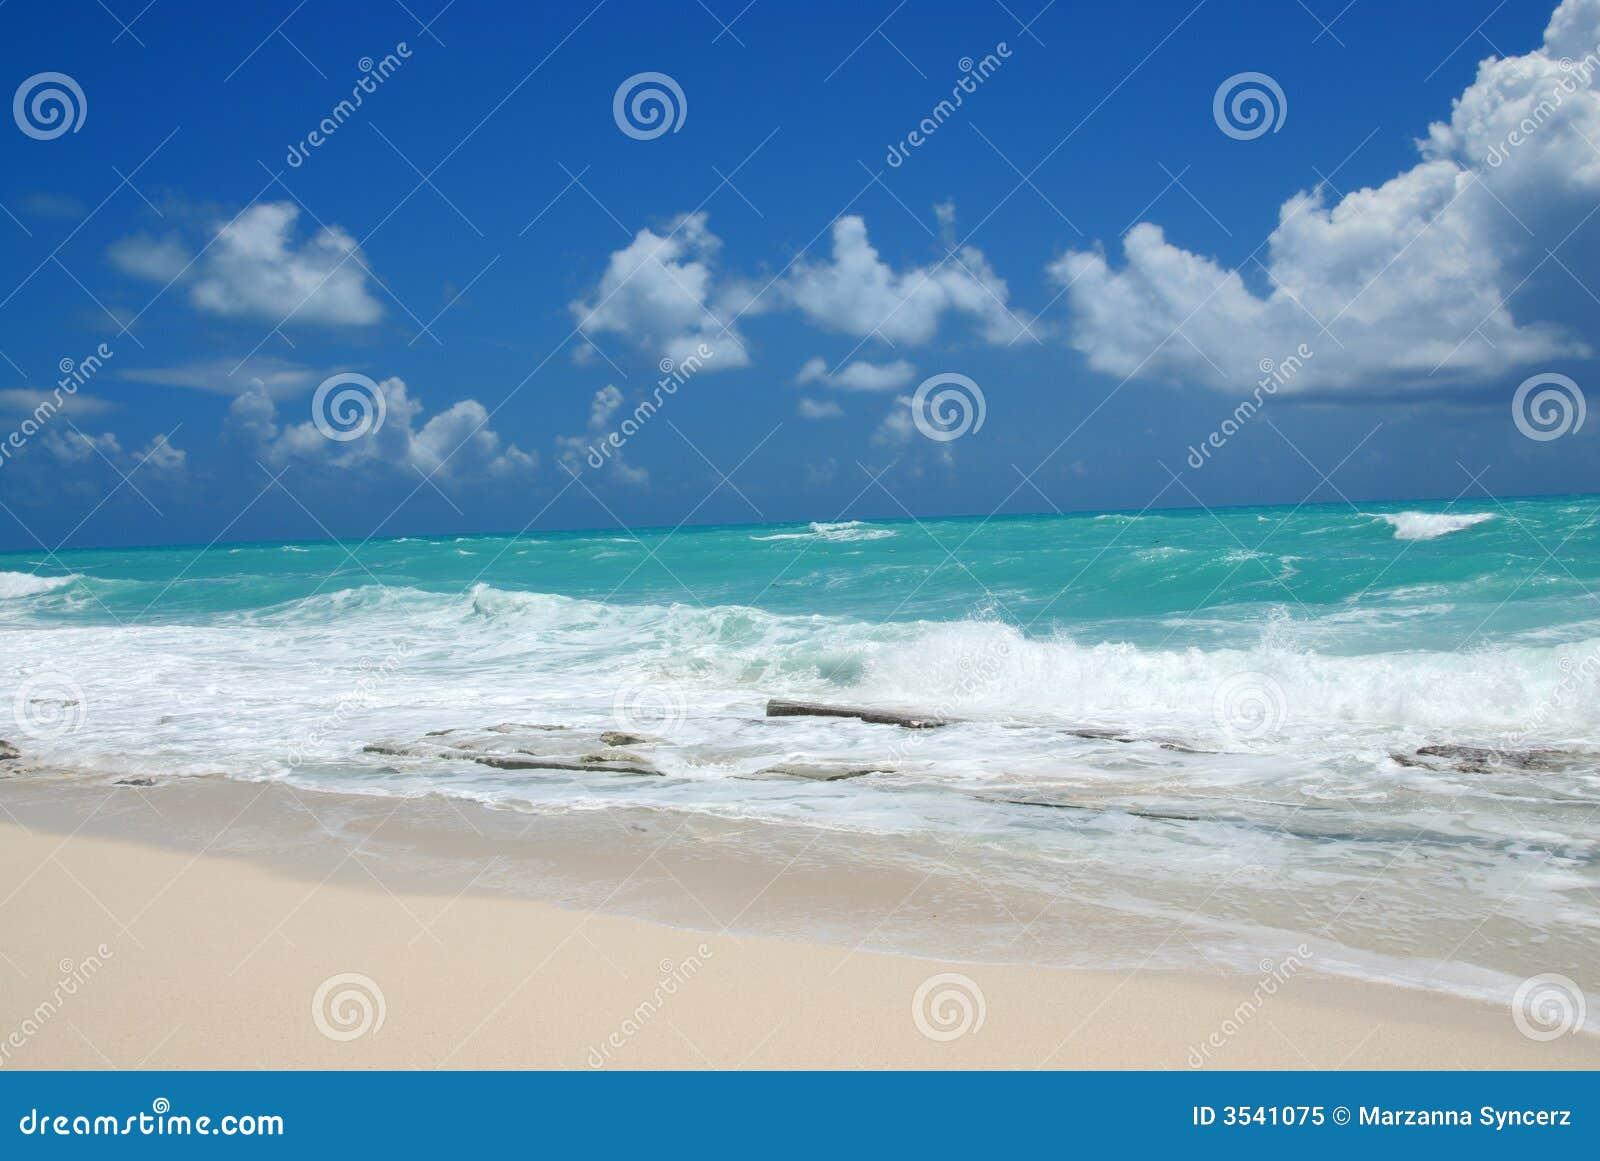 Ocean waves and beach scenery